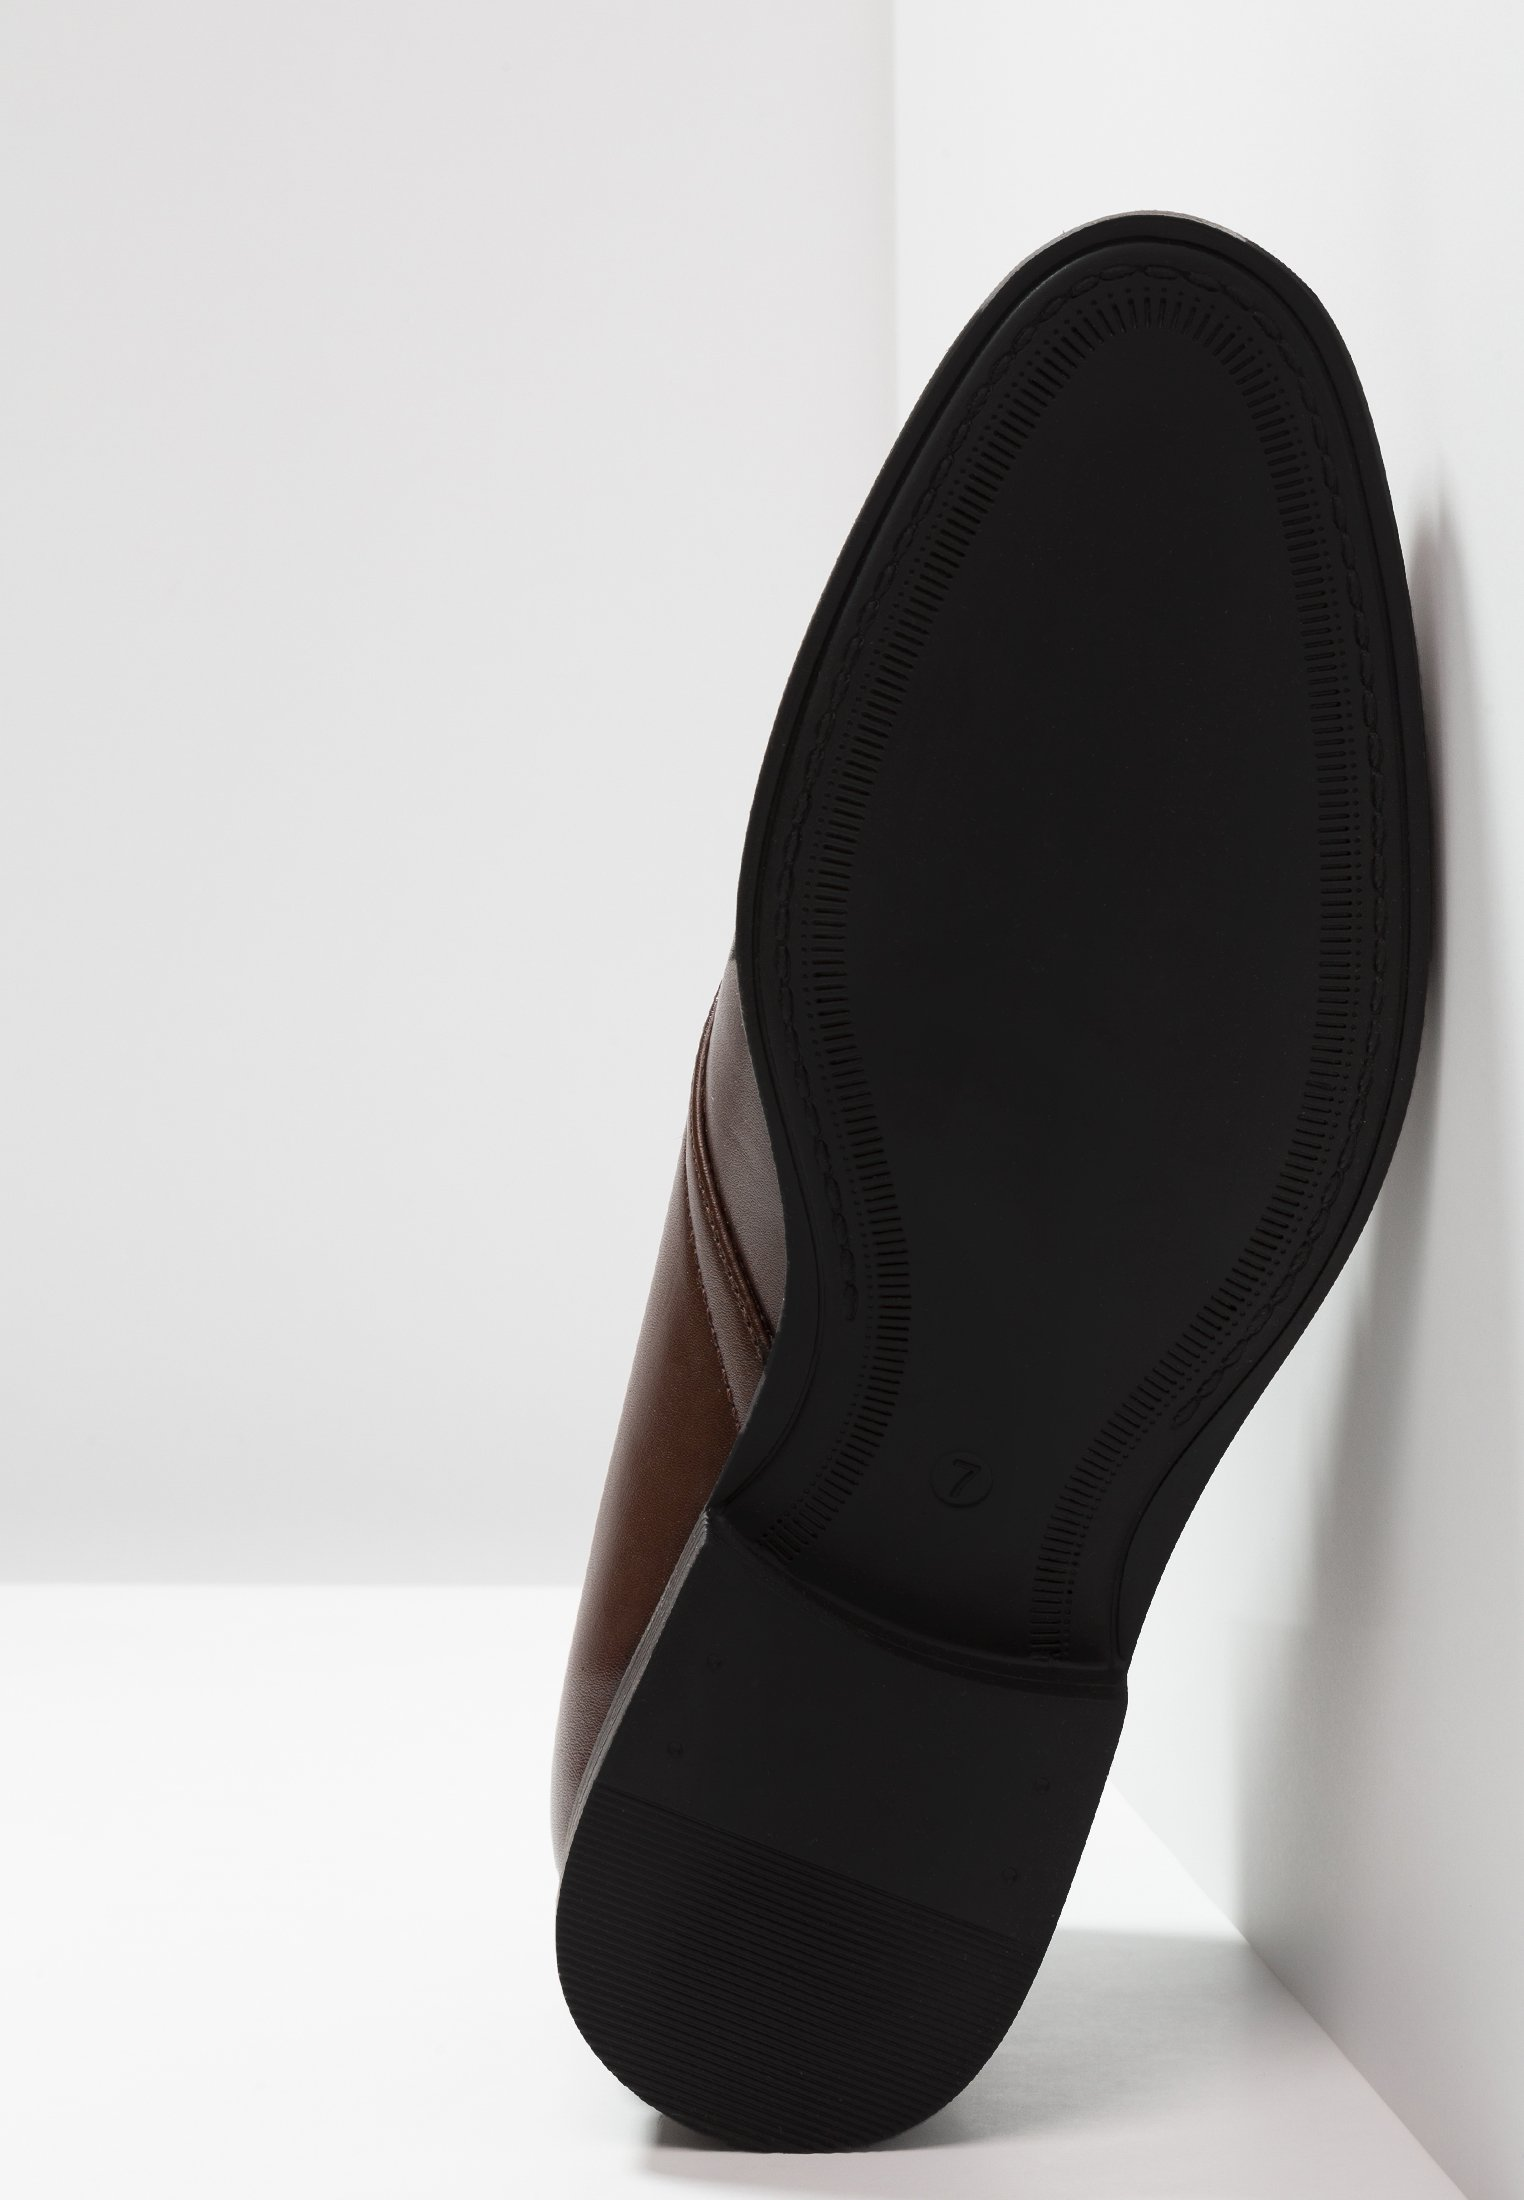 New Look Formal Chukka Boot - Business-schnürer Dark Brown Black Friday